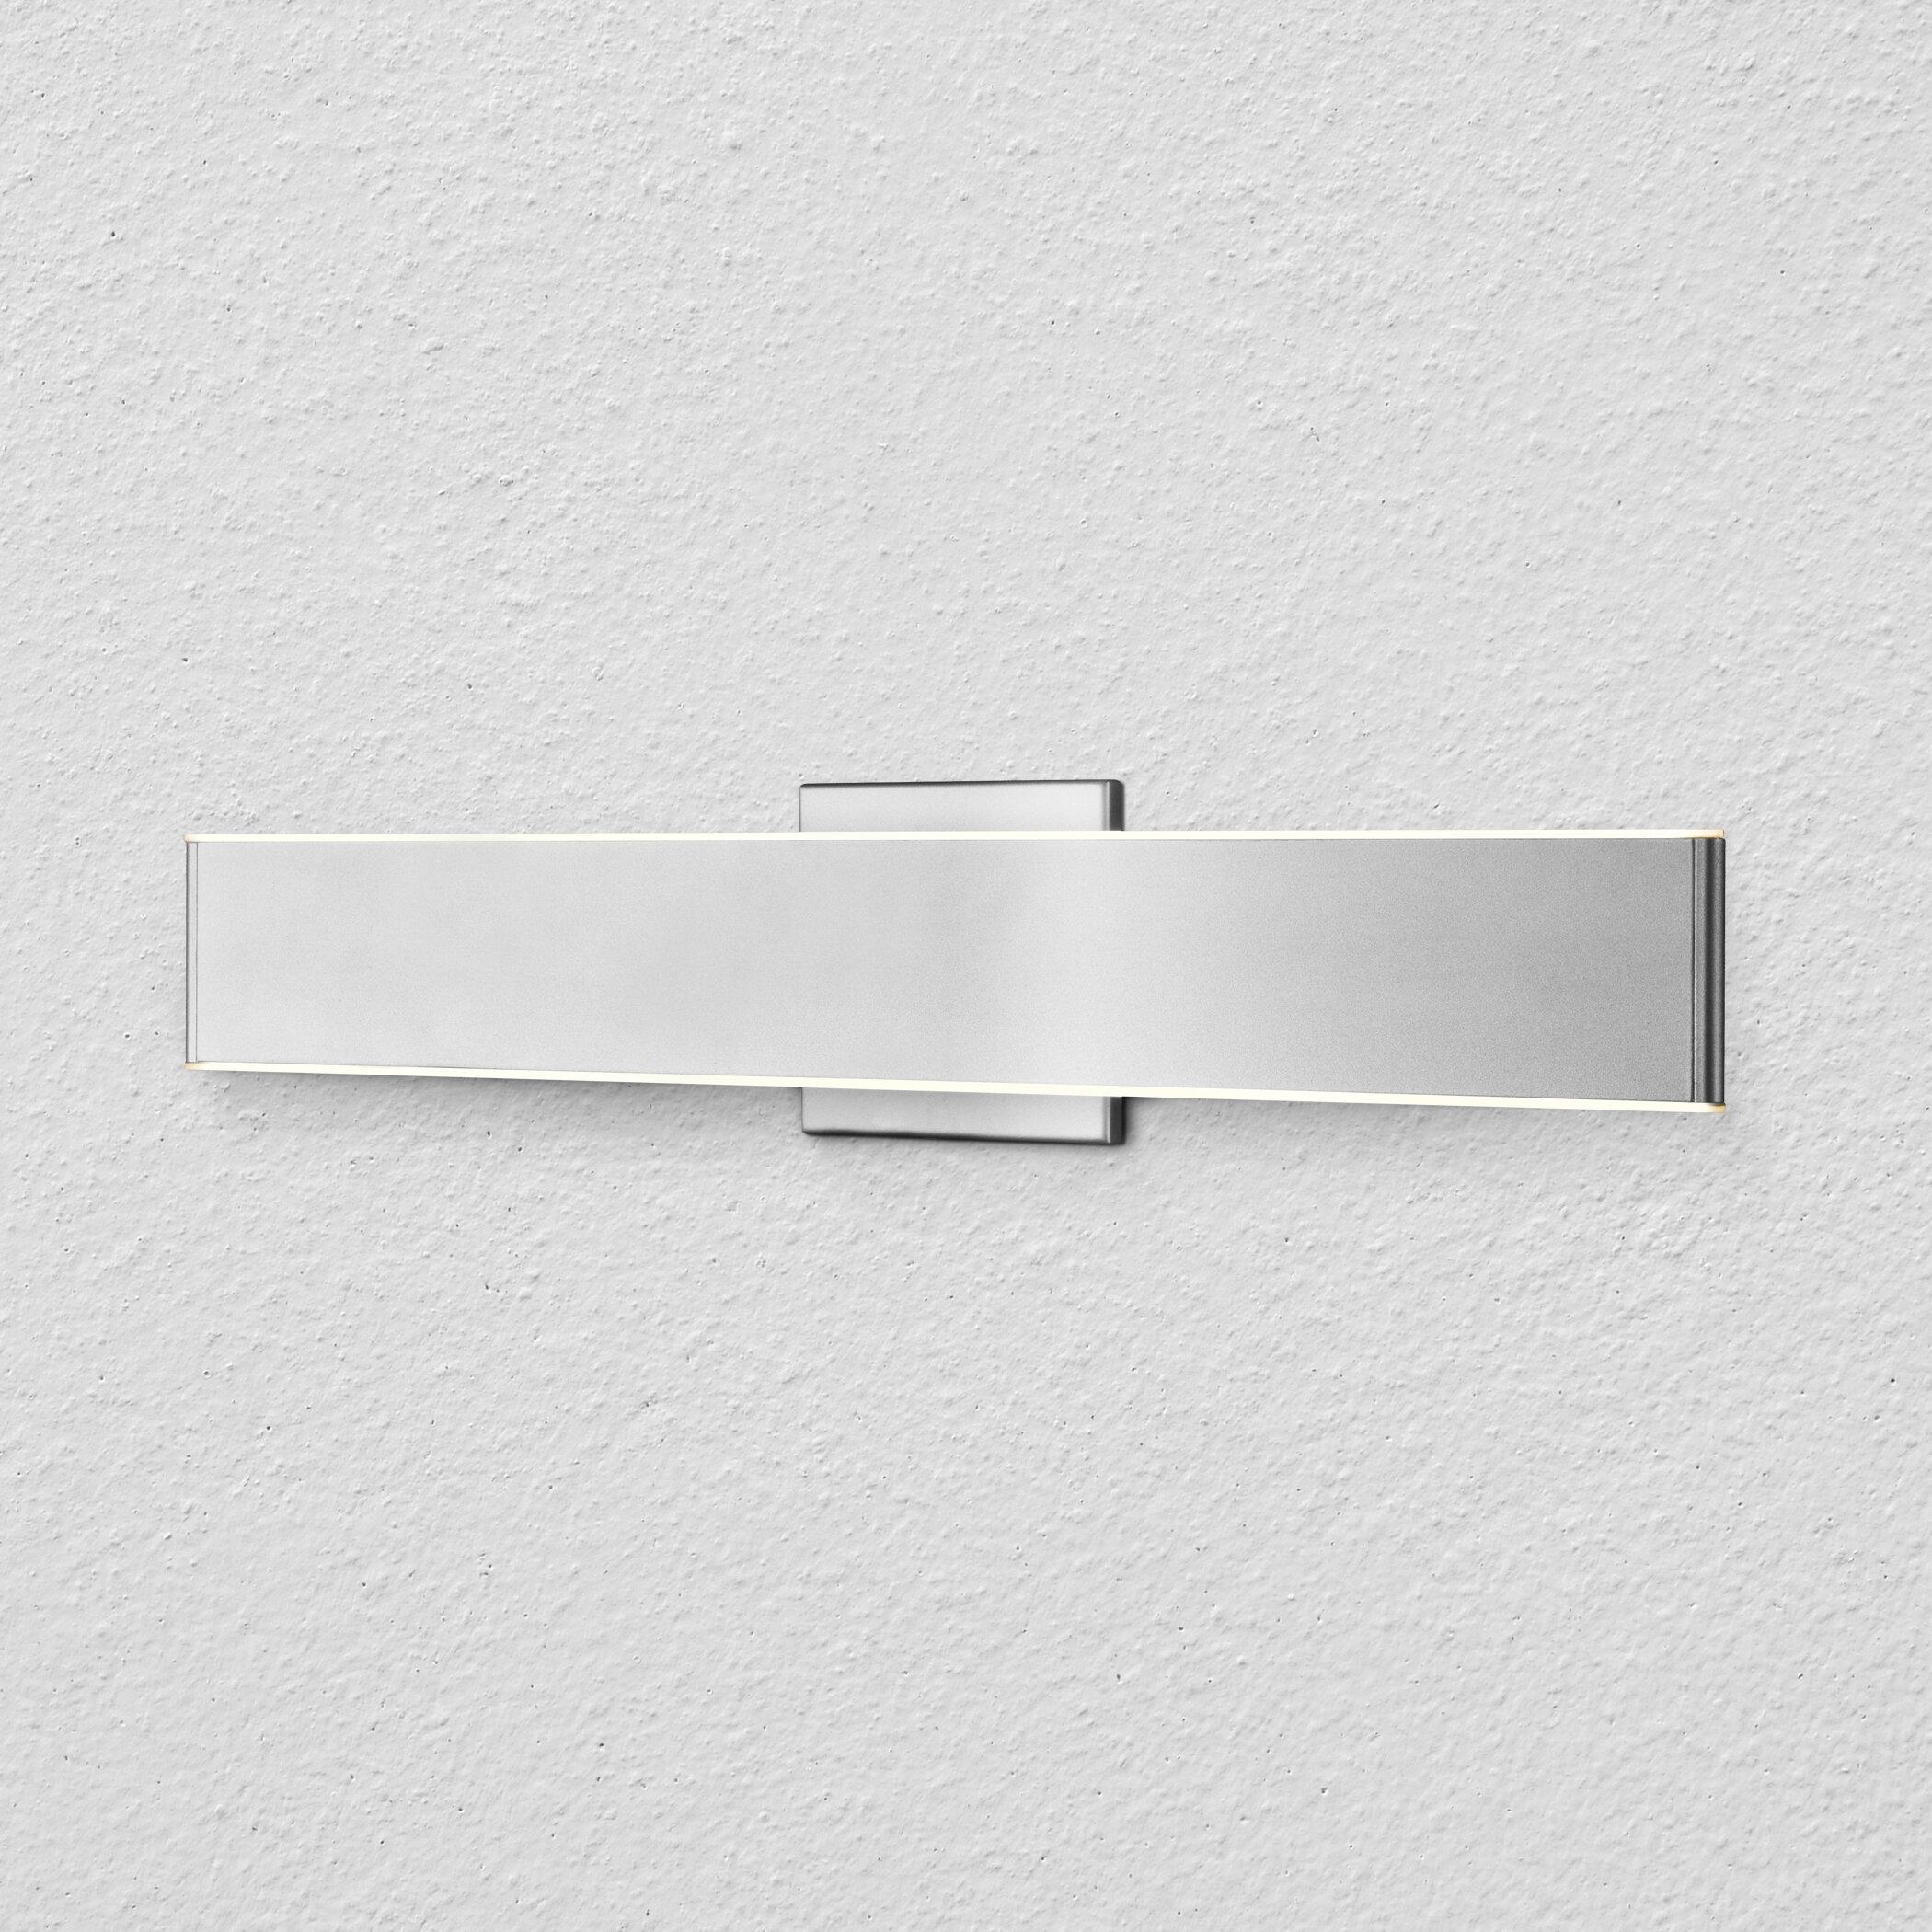 48 Inch Bar Bathroom Vanity Lighting You Ll Love In 2021 Wayfair